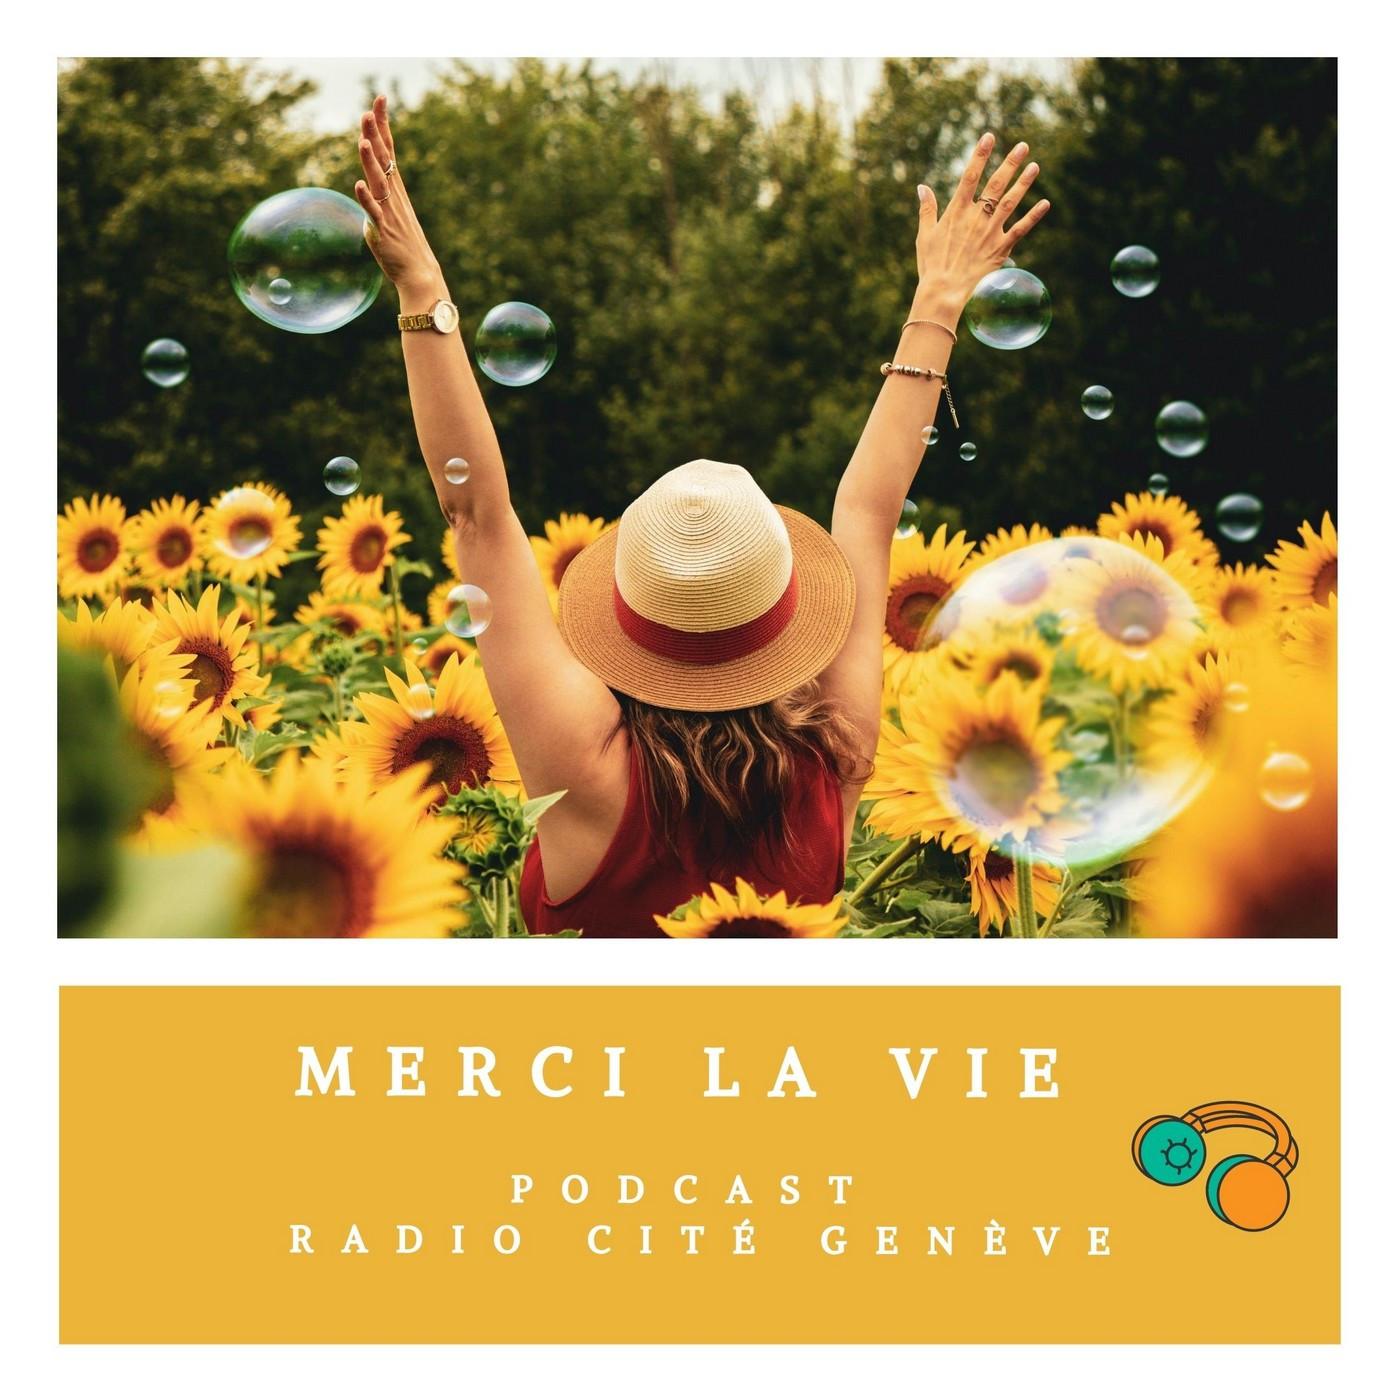 Merci la Vie du 26/01/21 - Gaëlle Mogli